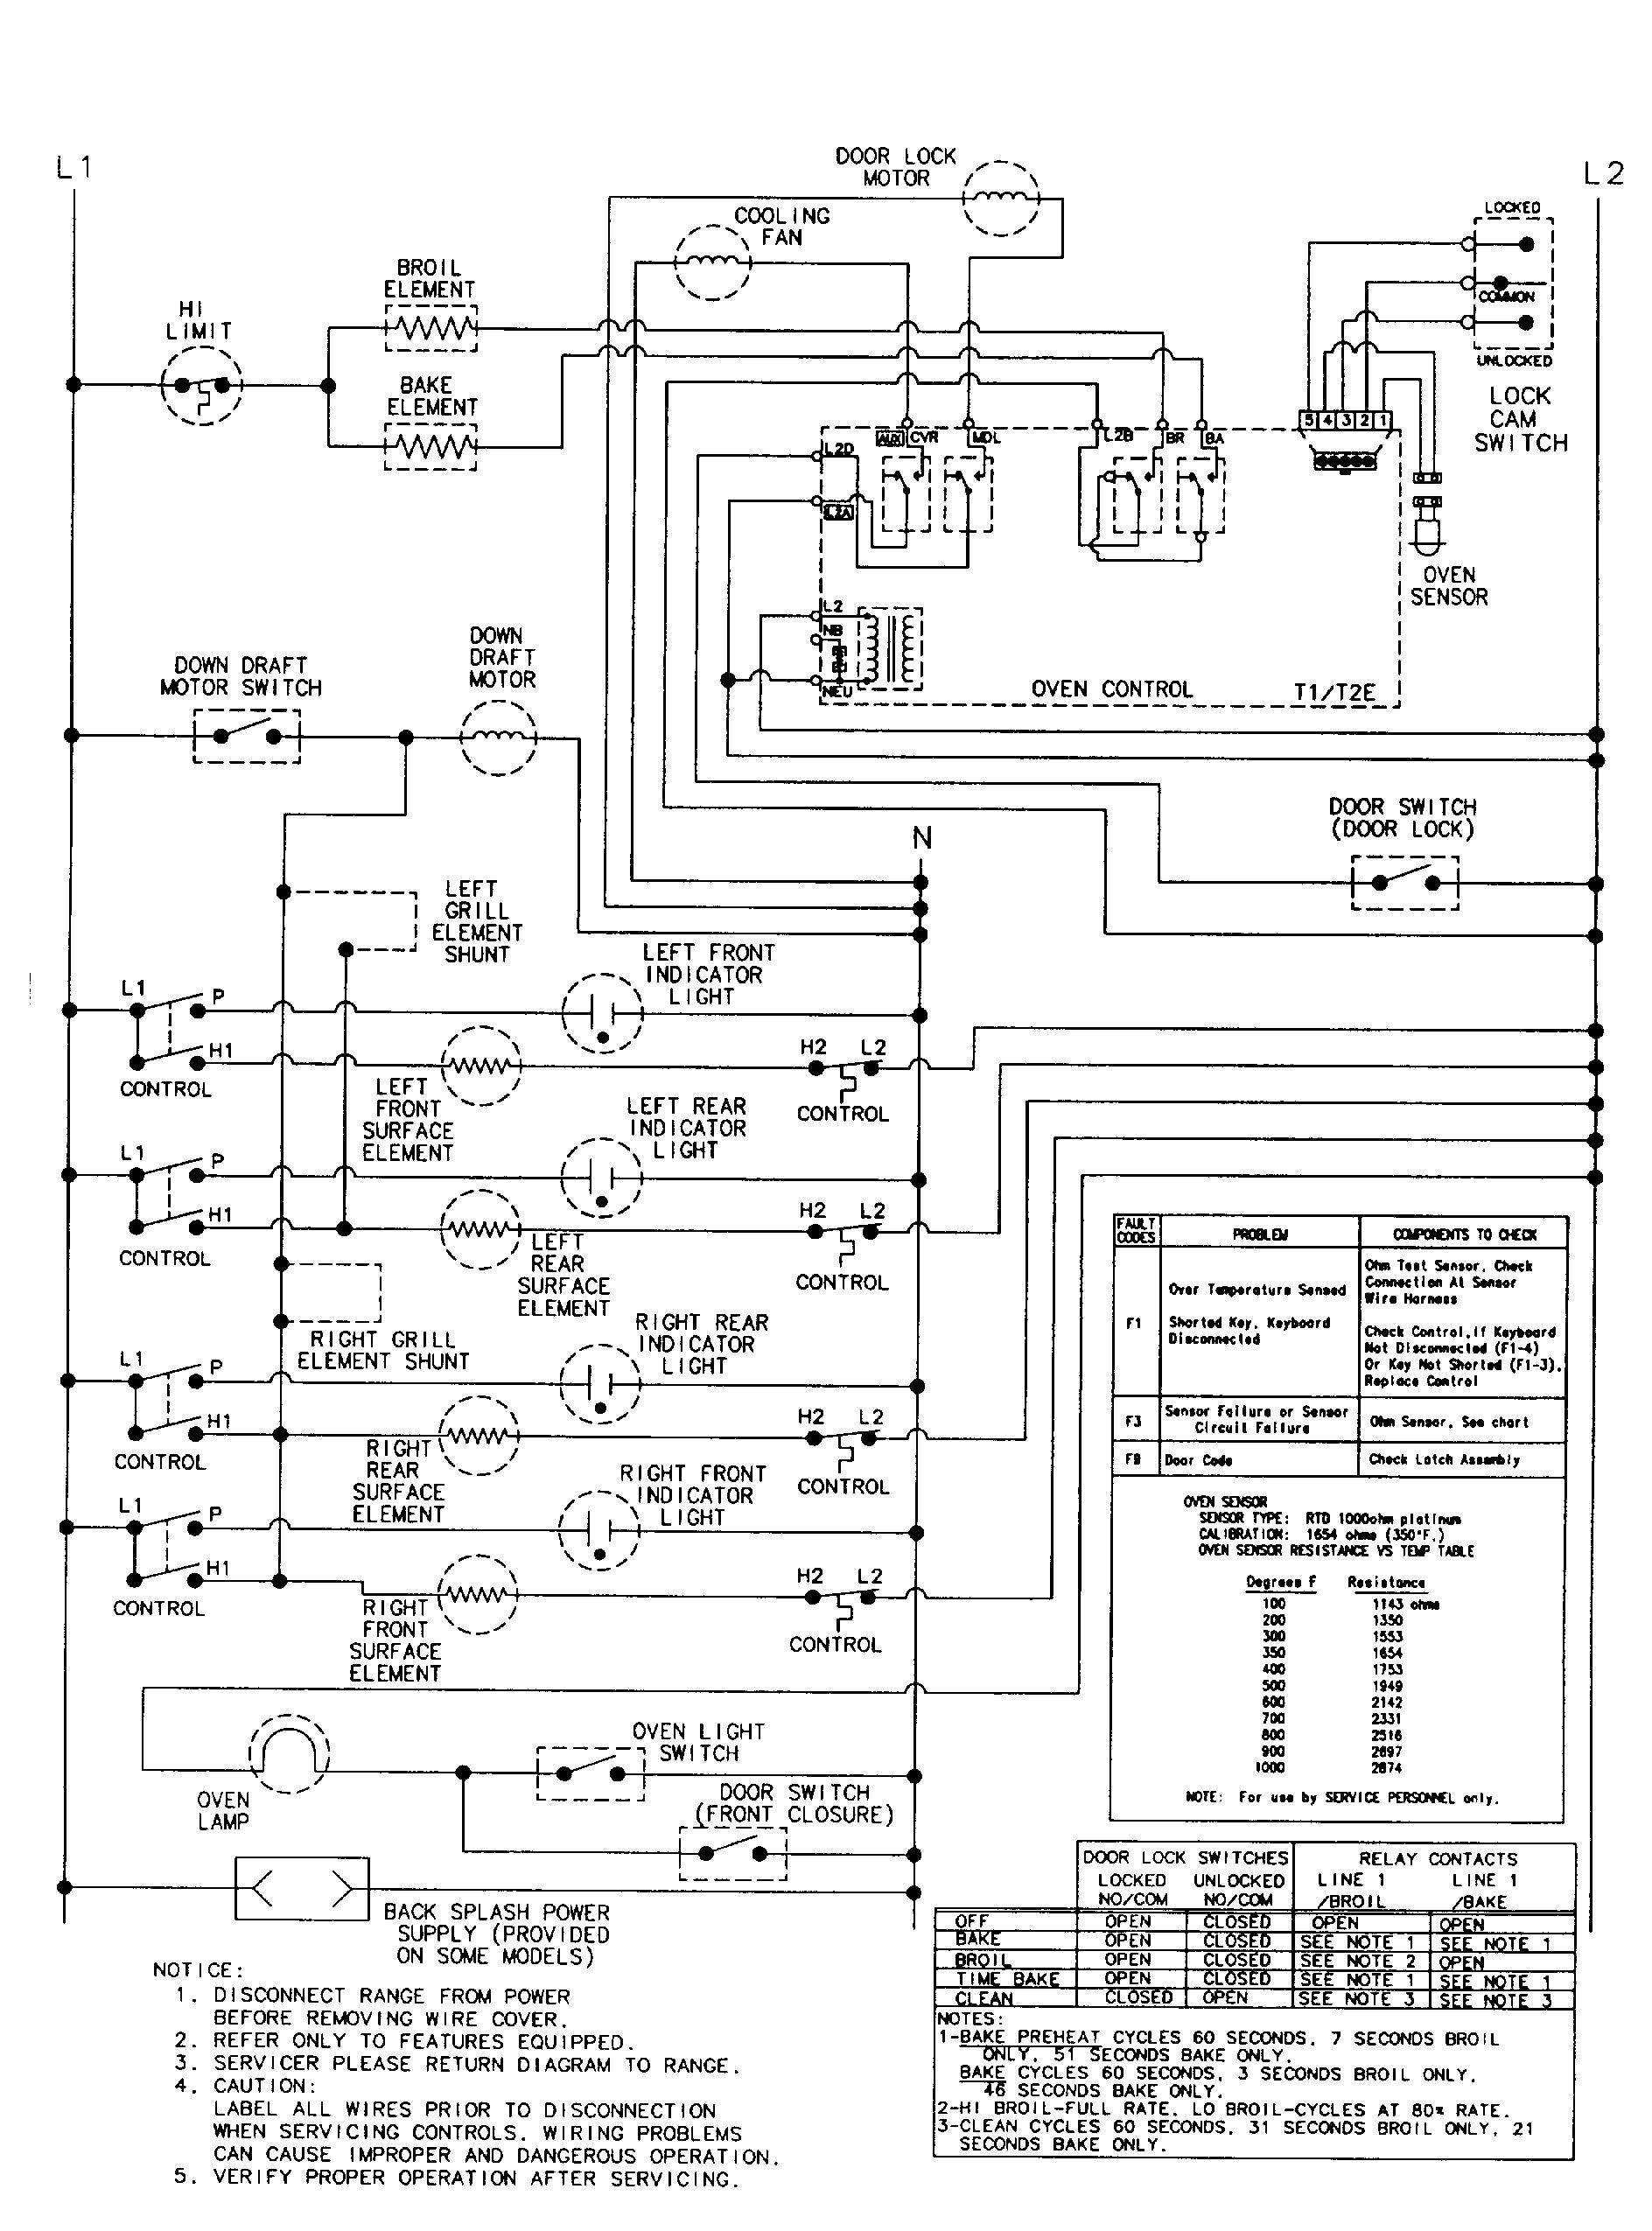 wiring information sve47100b w ser 15 parts jenn air cooktop c221 wiring diagram jenn air cooktop c226, jenn jenn air c301 wiring diagram at gsmx.co